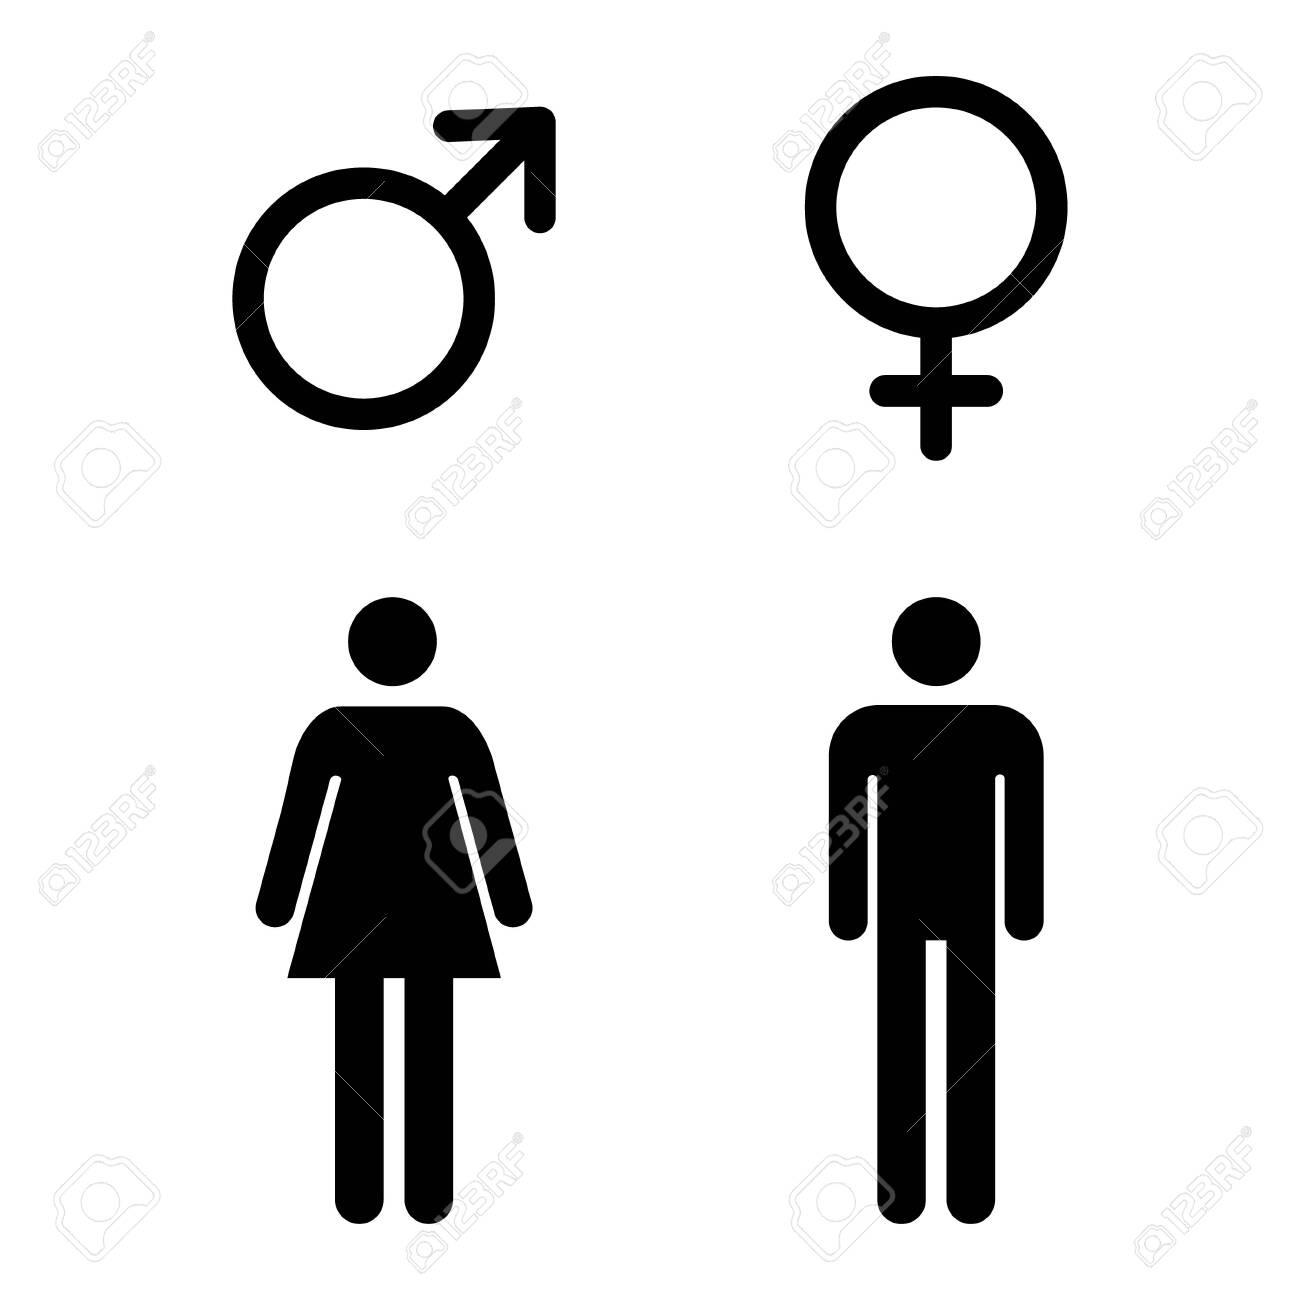 Male and female icon, symbol set. Website design vector illustration isolated on white background . - 133772757